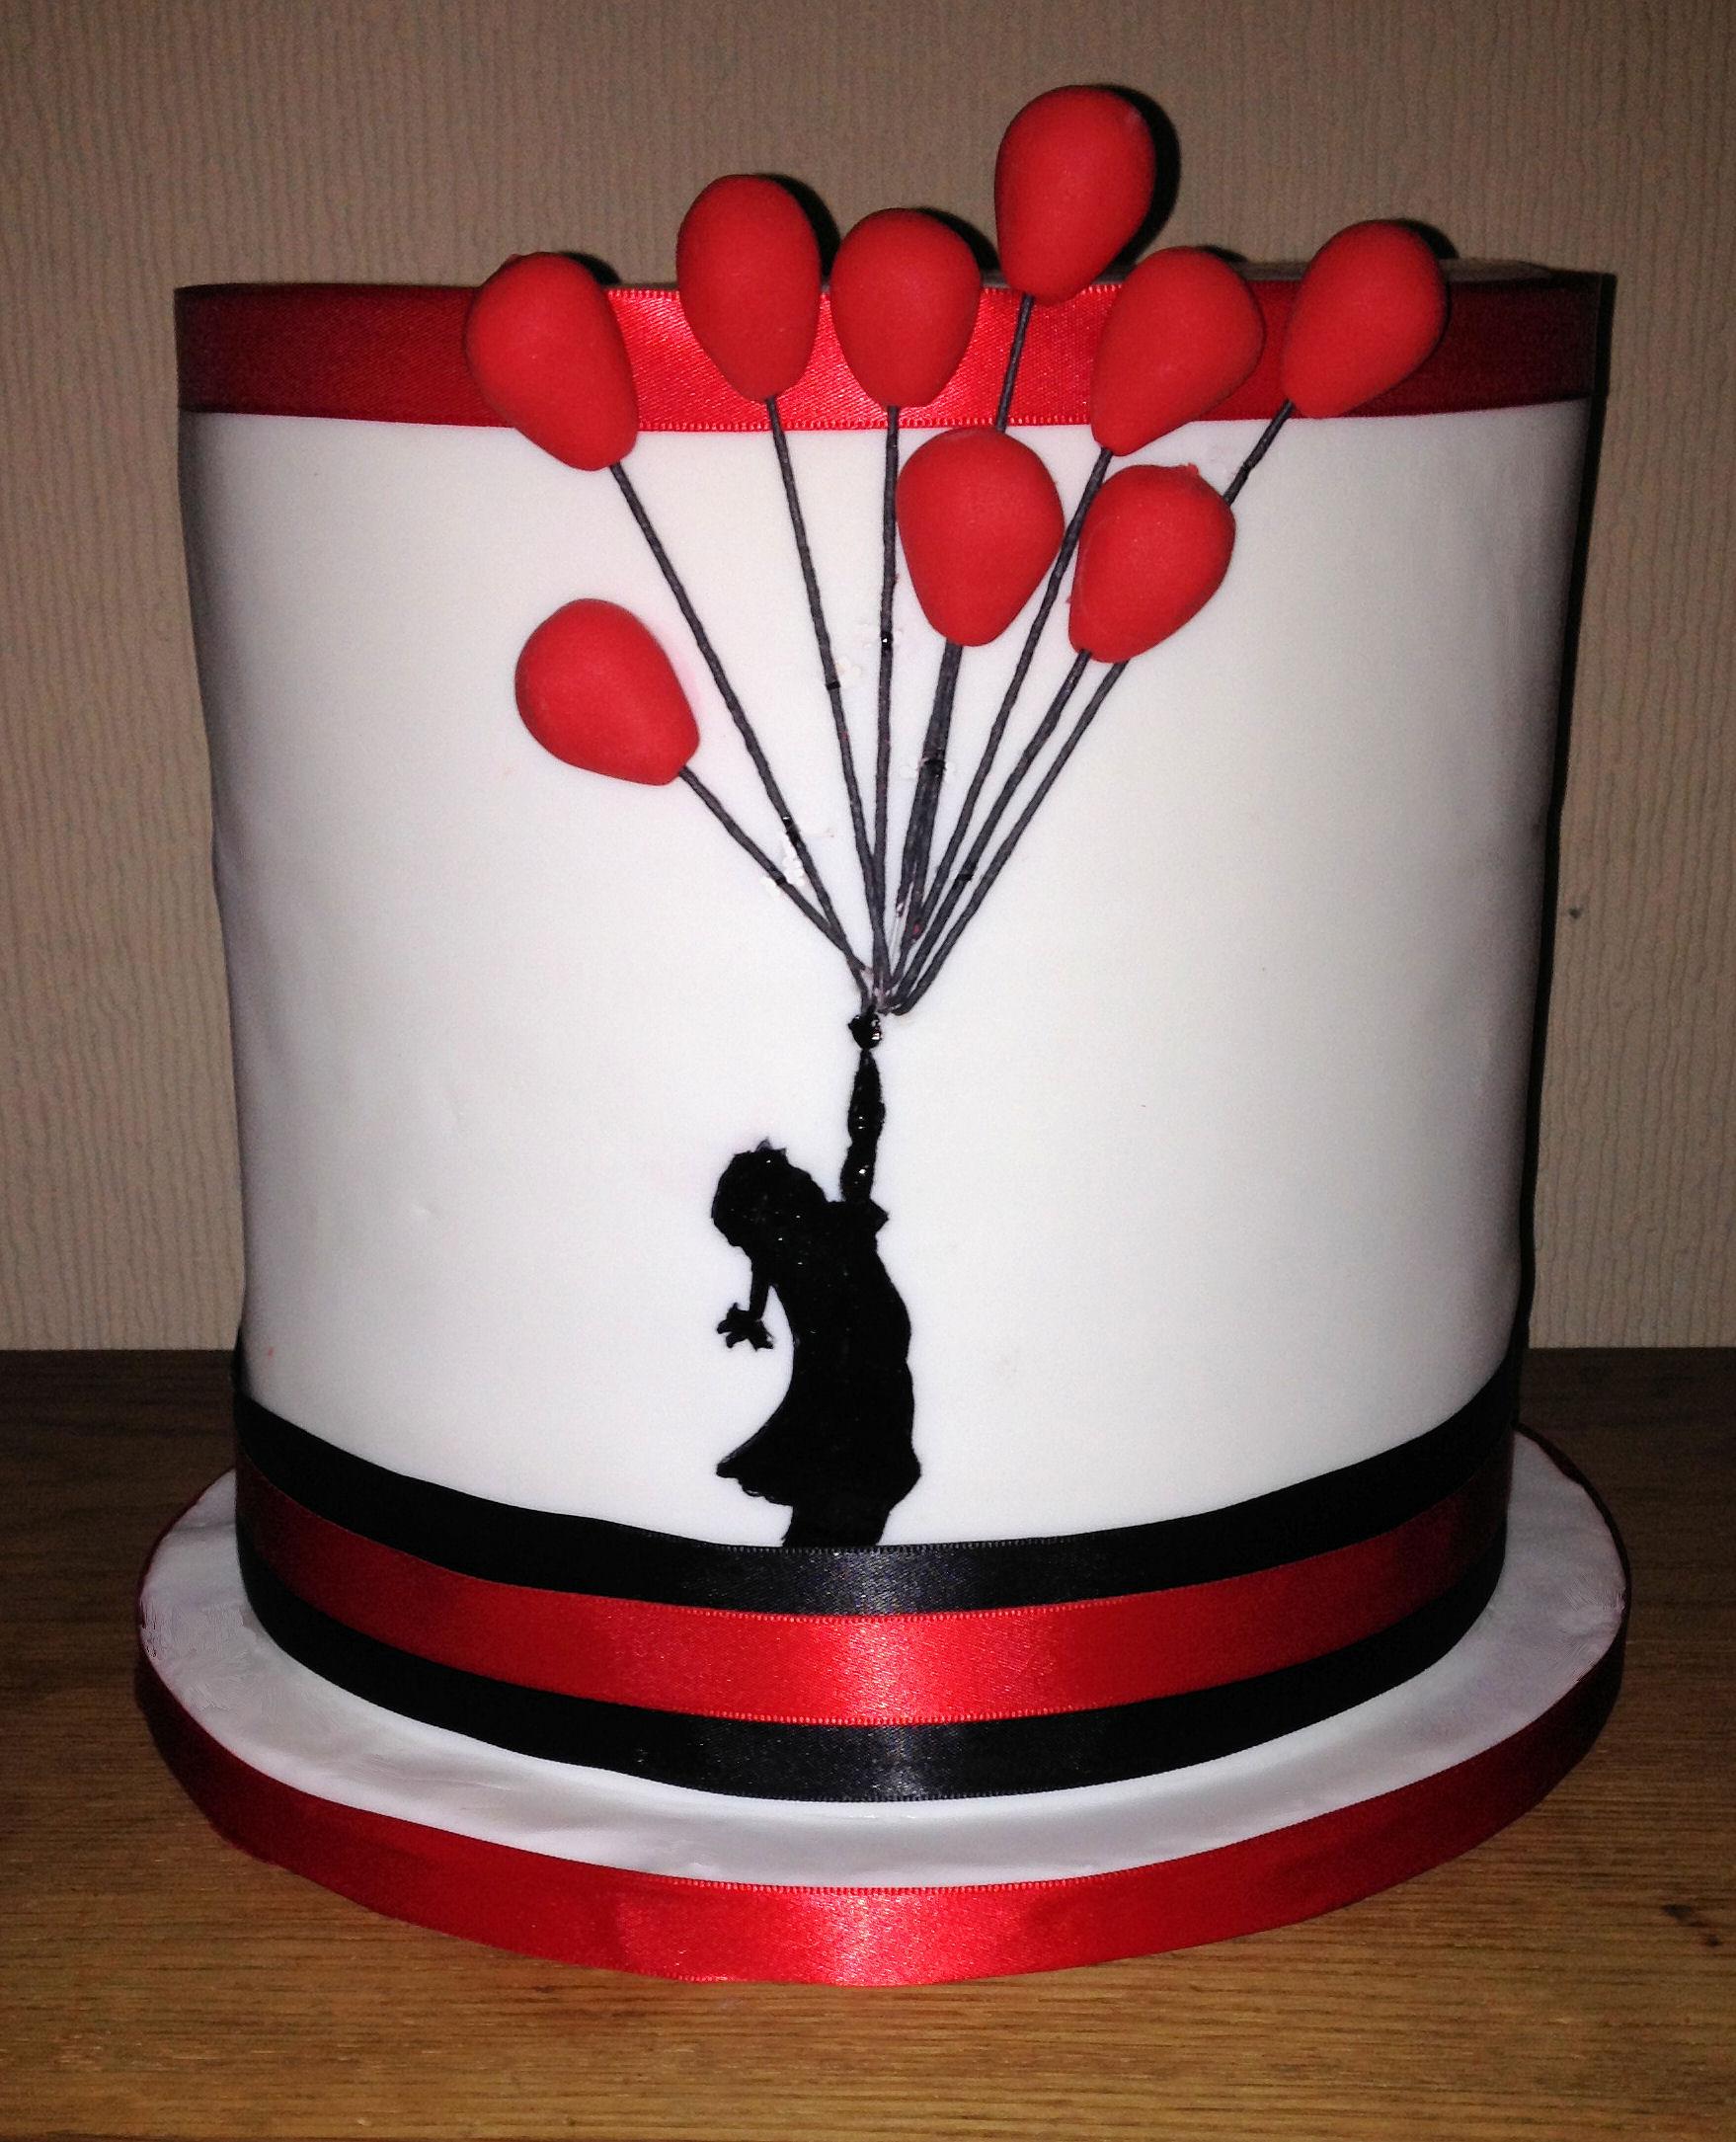 balloon themed wedding cake